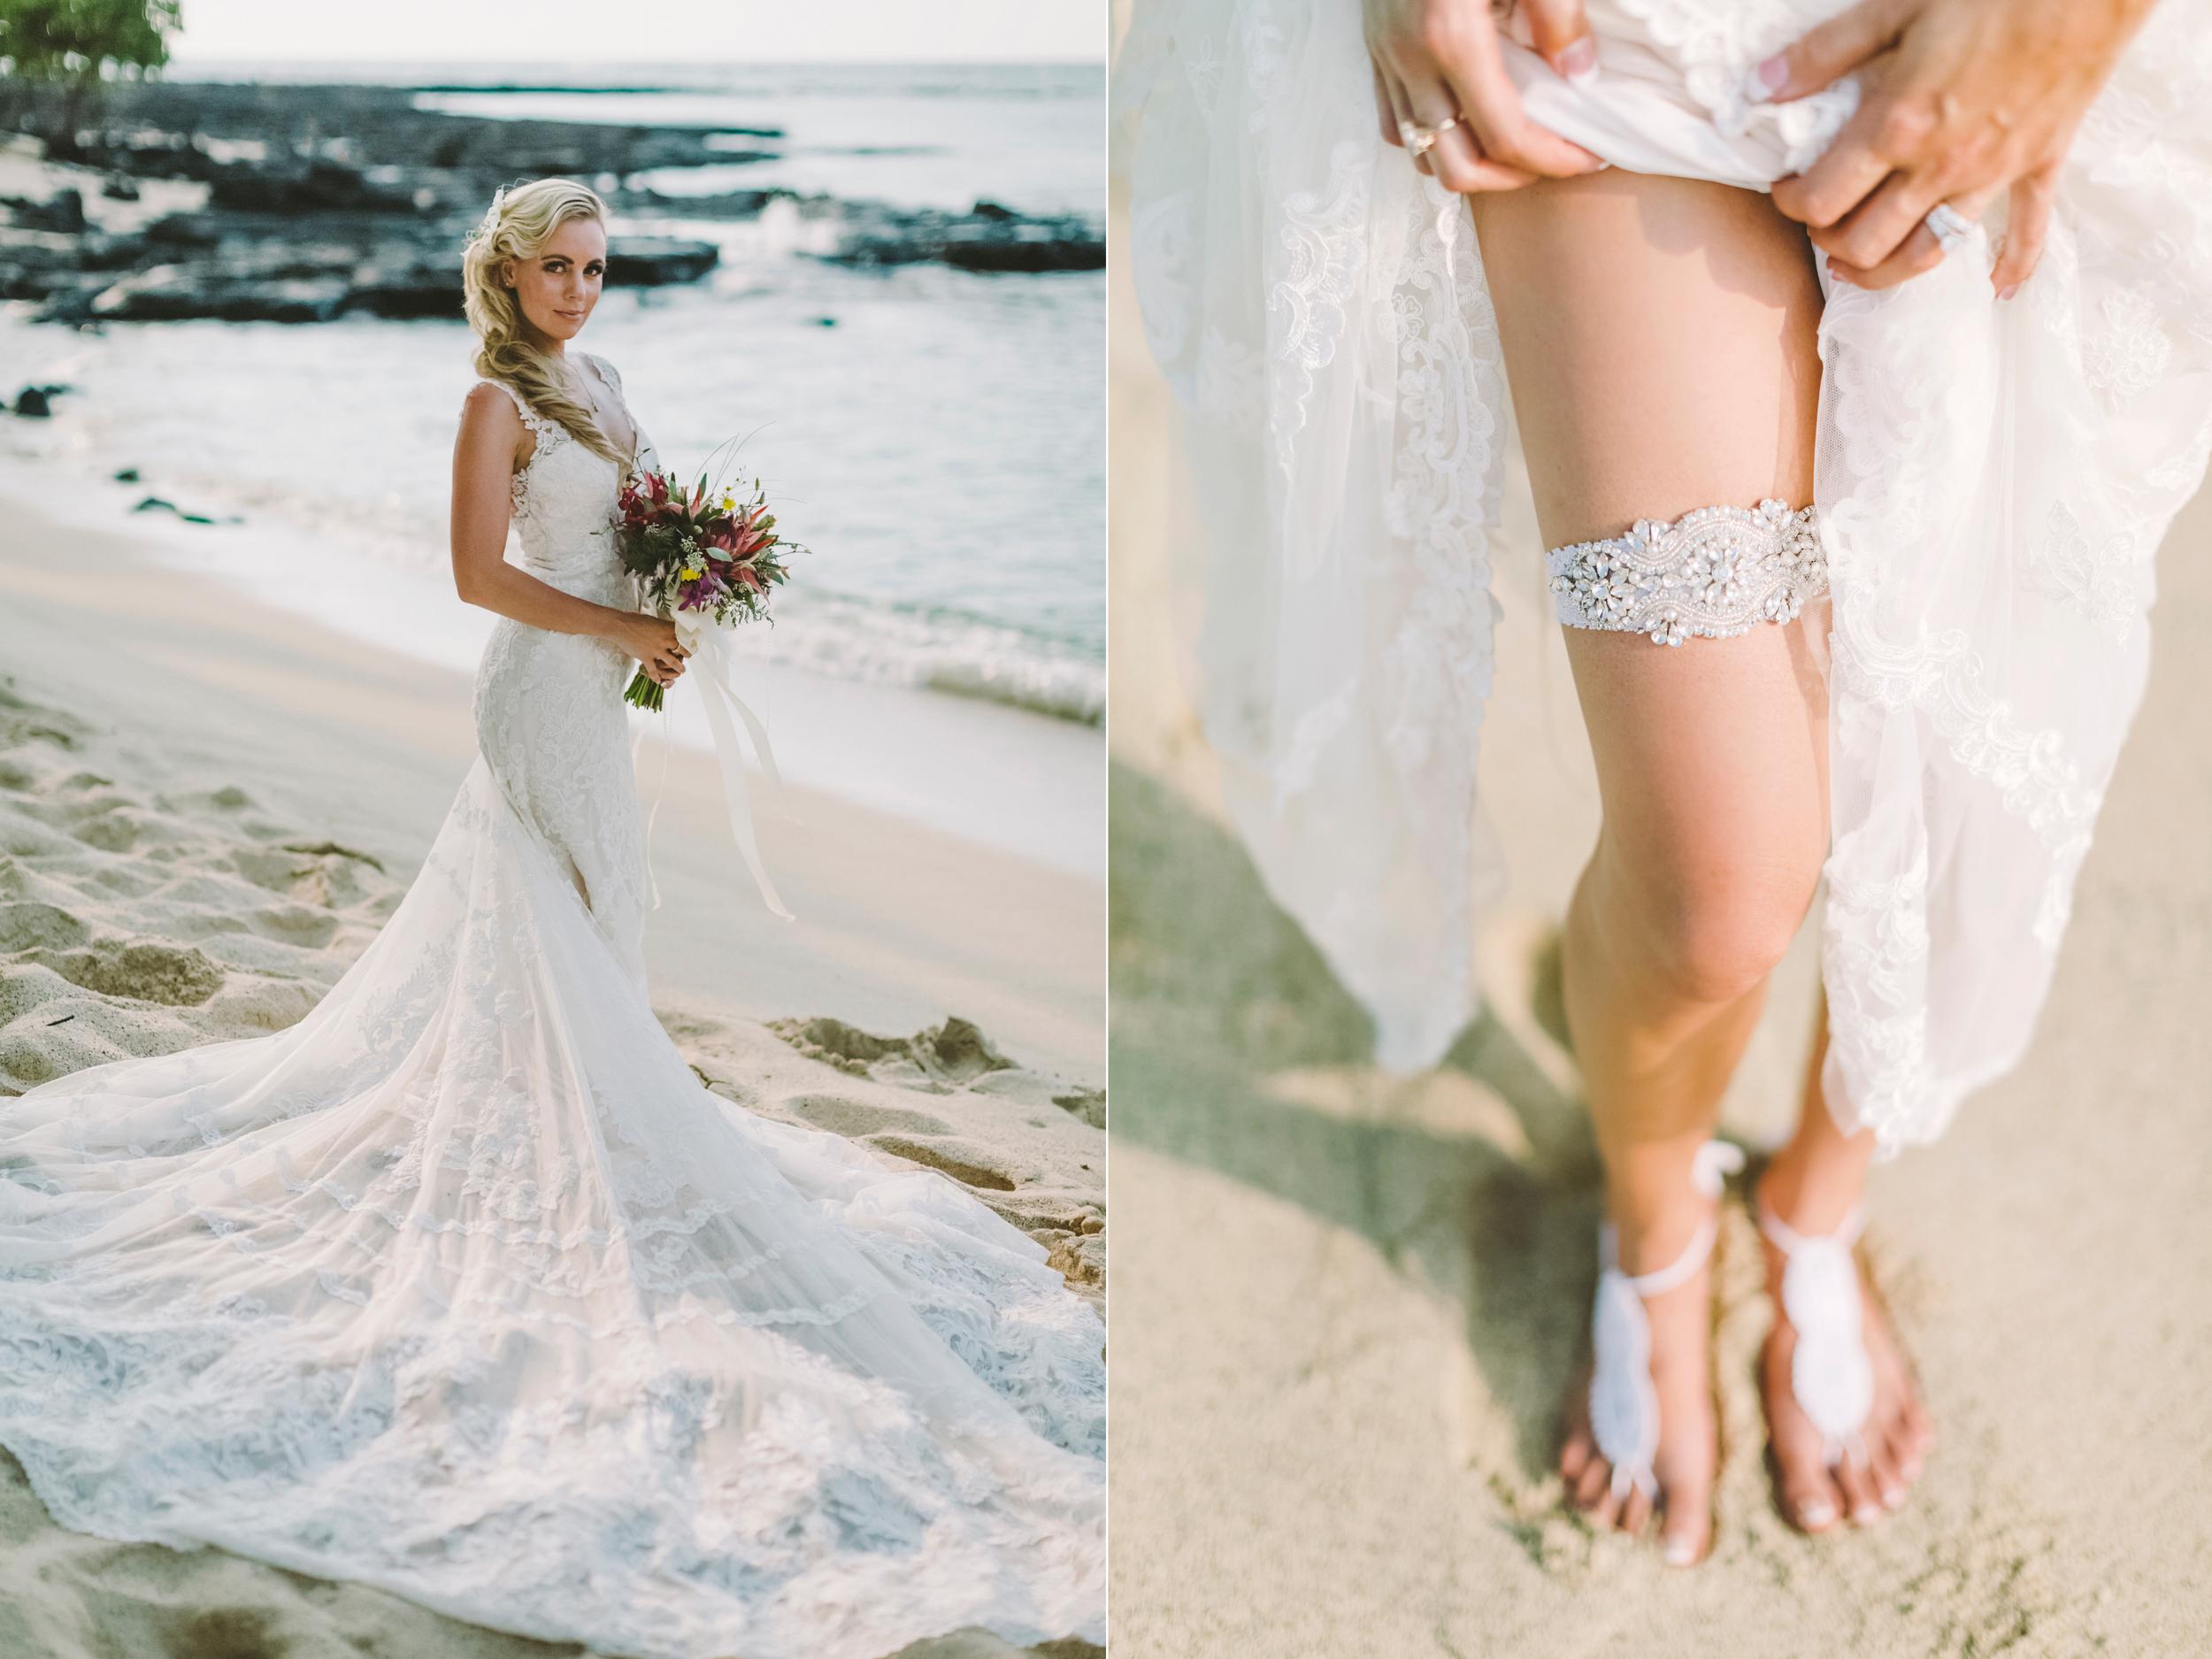 angie-diaz-photography-hawaii-wedding-photographer-kelli-jay-88.jpg